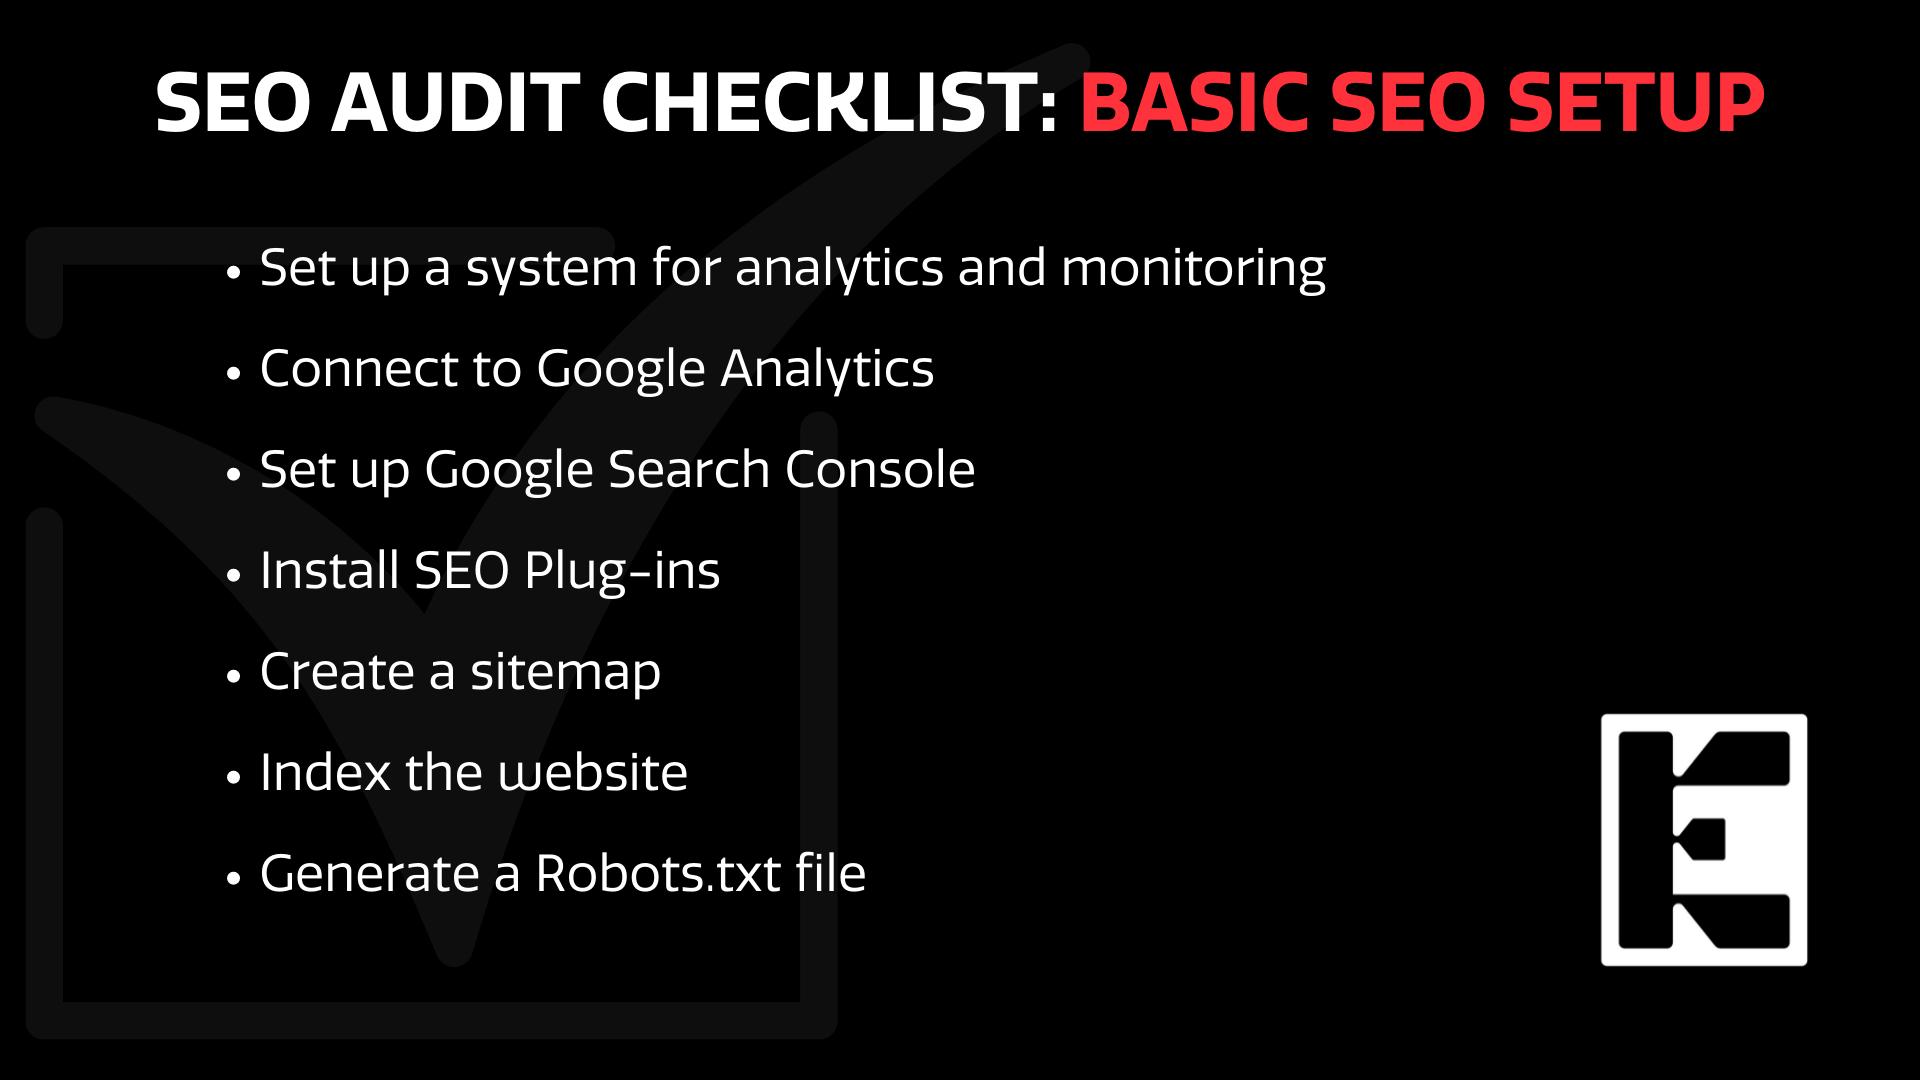 SEO set up checklist